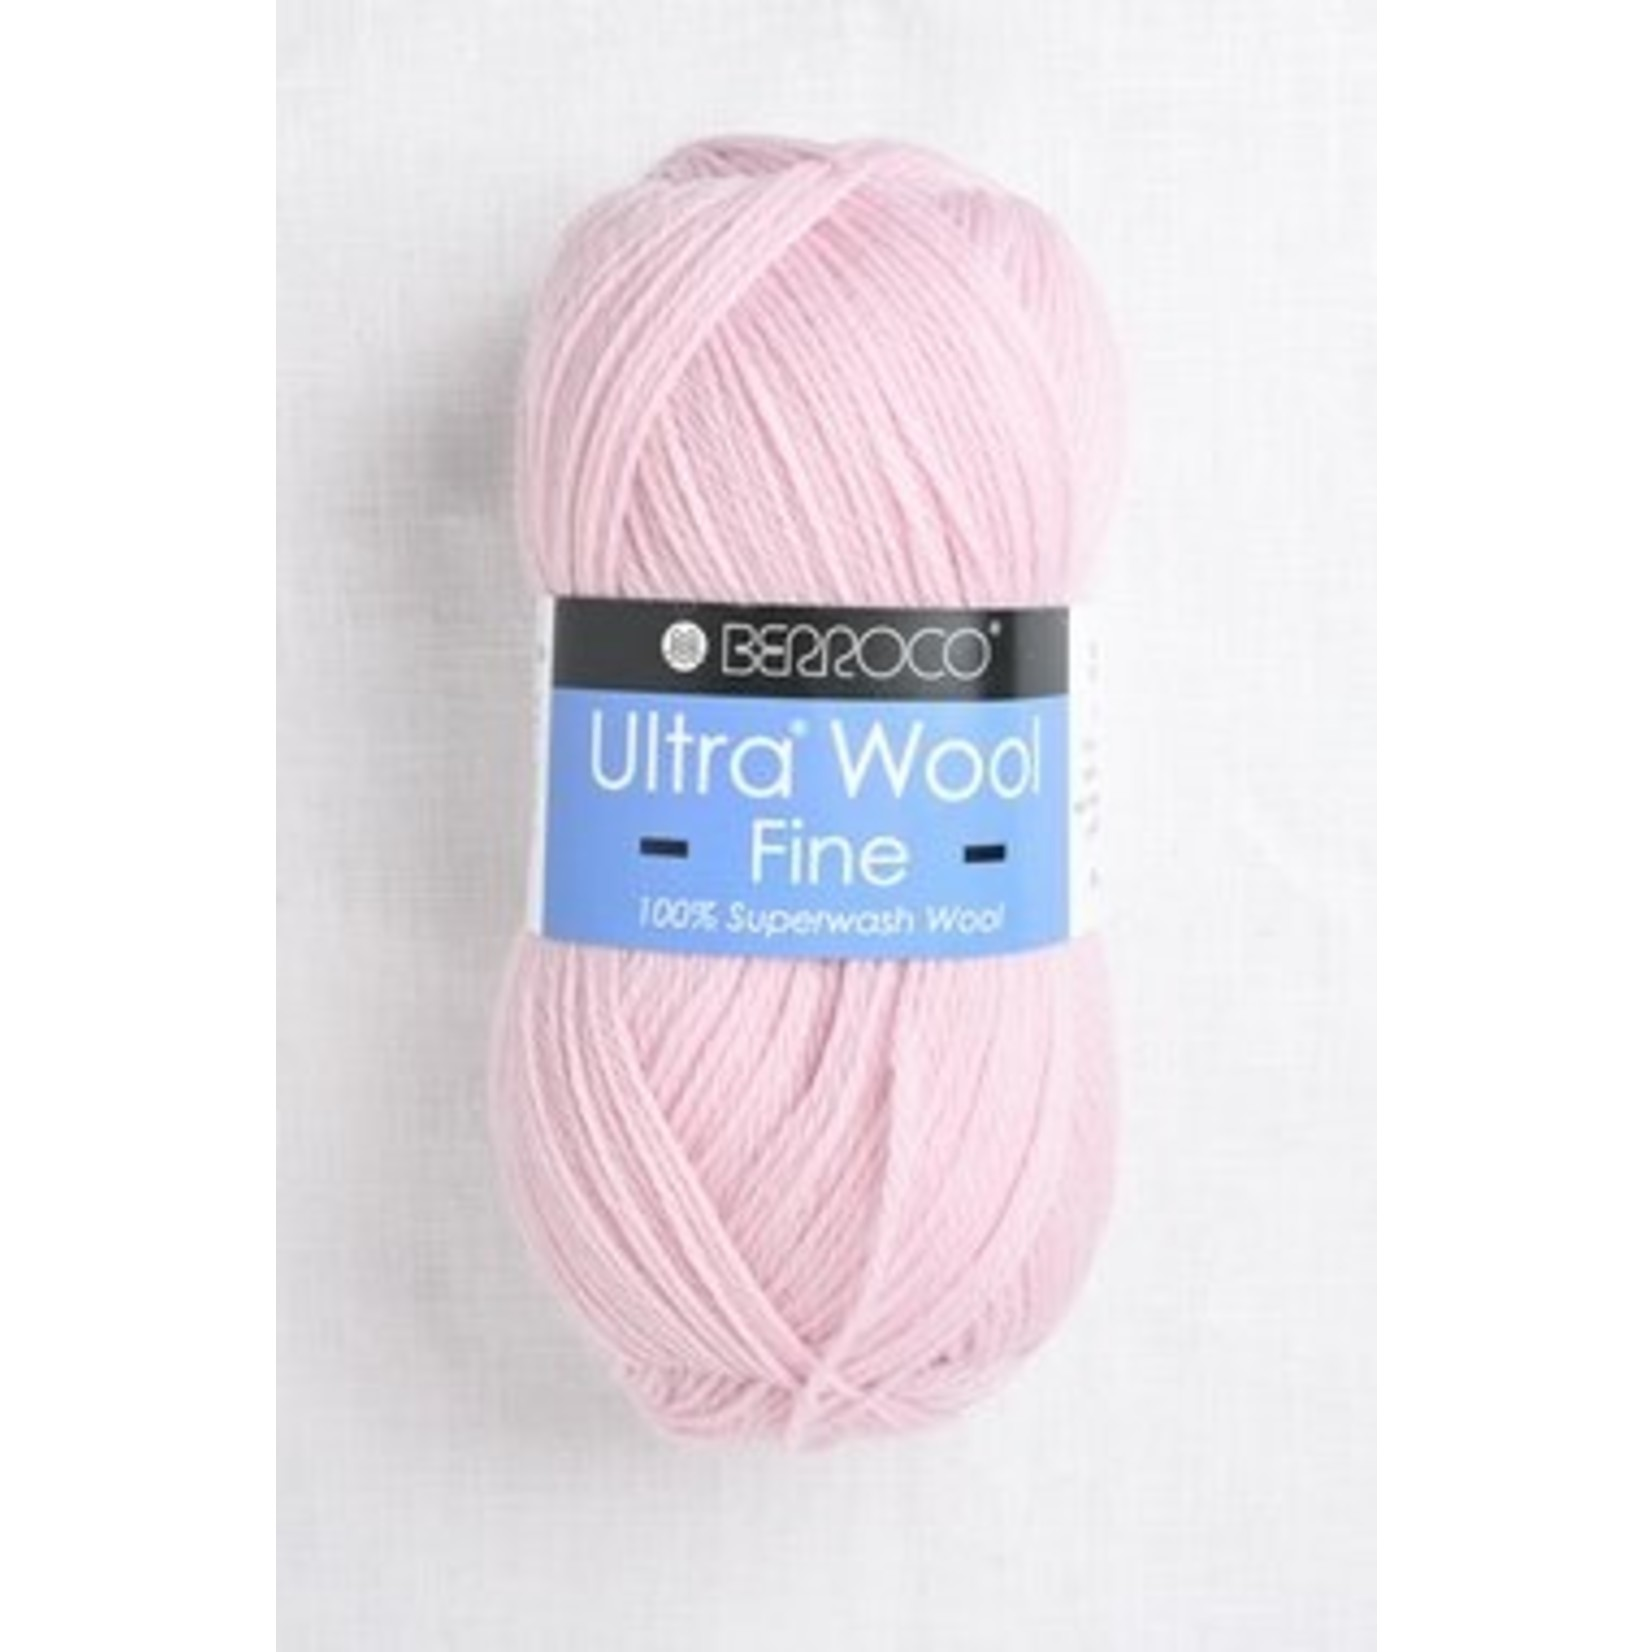 Berroco Berroco Ultra Wool Fine, 5310, Alyssum